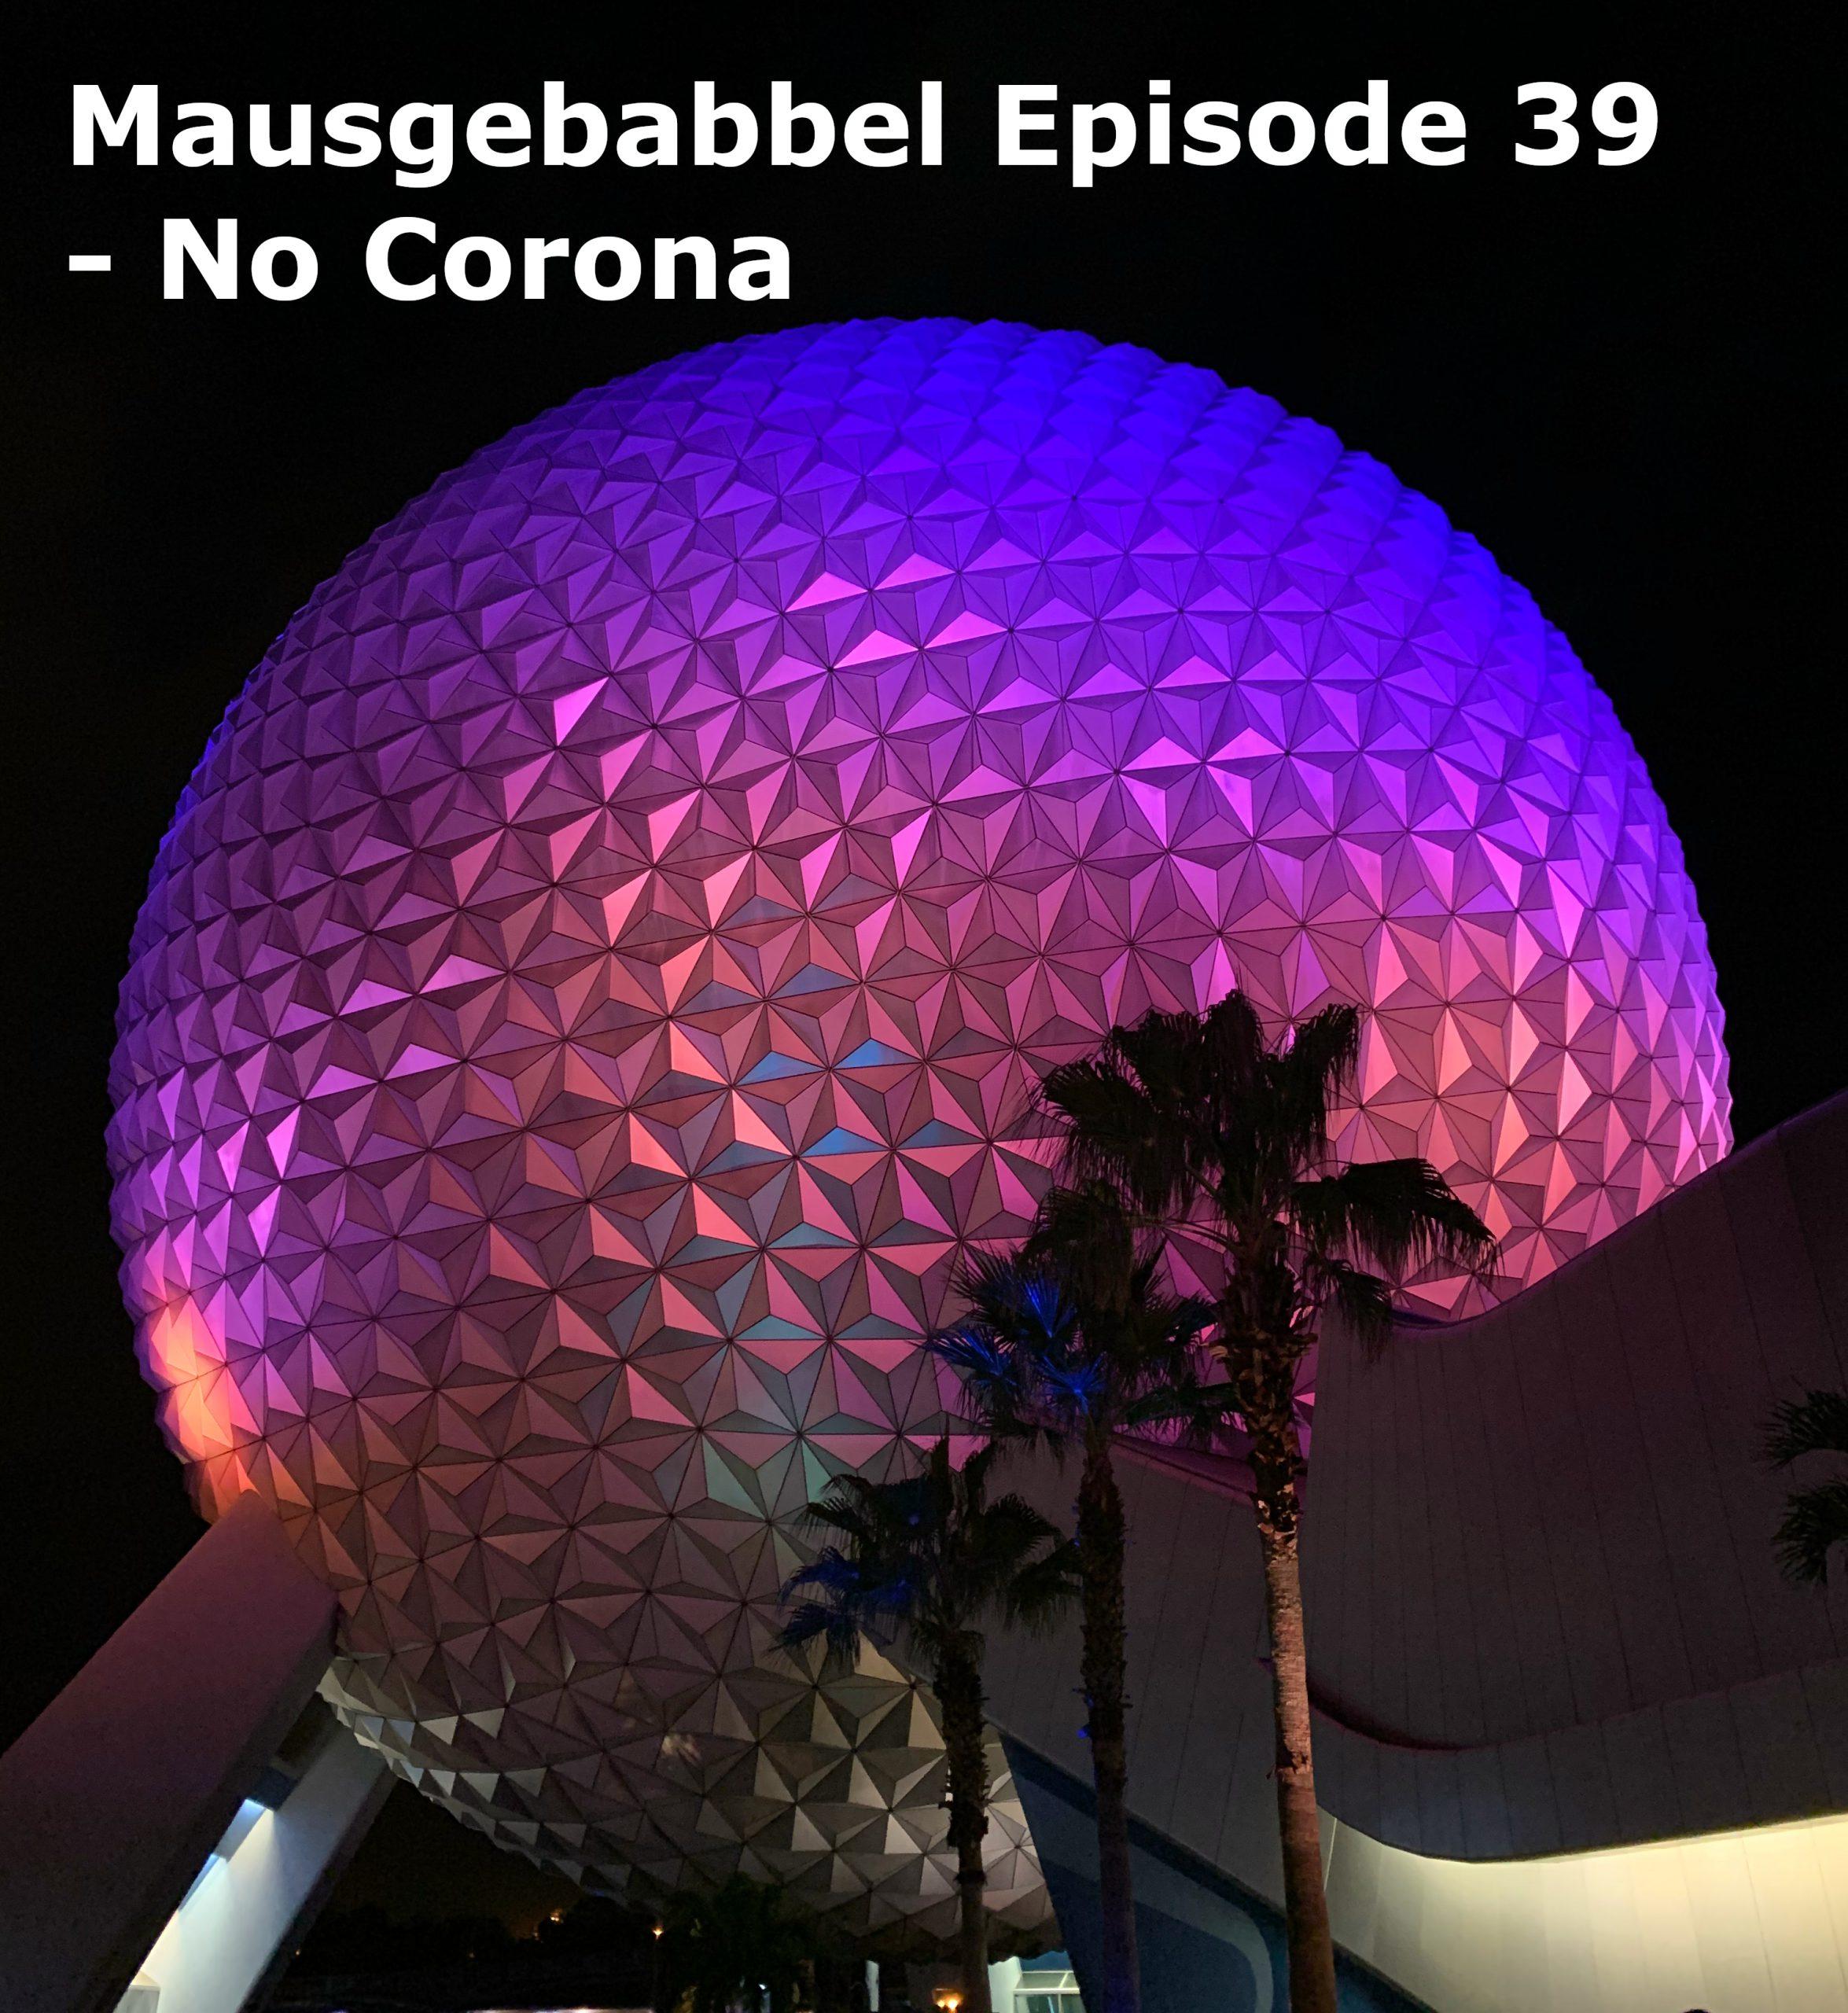 Mausgebabbel 39